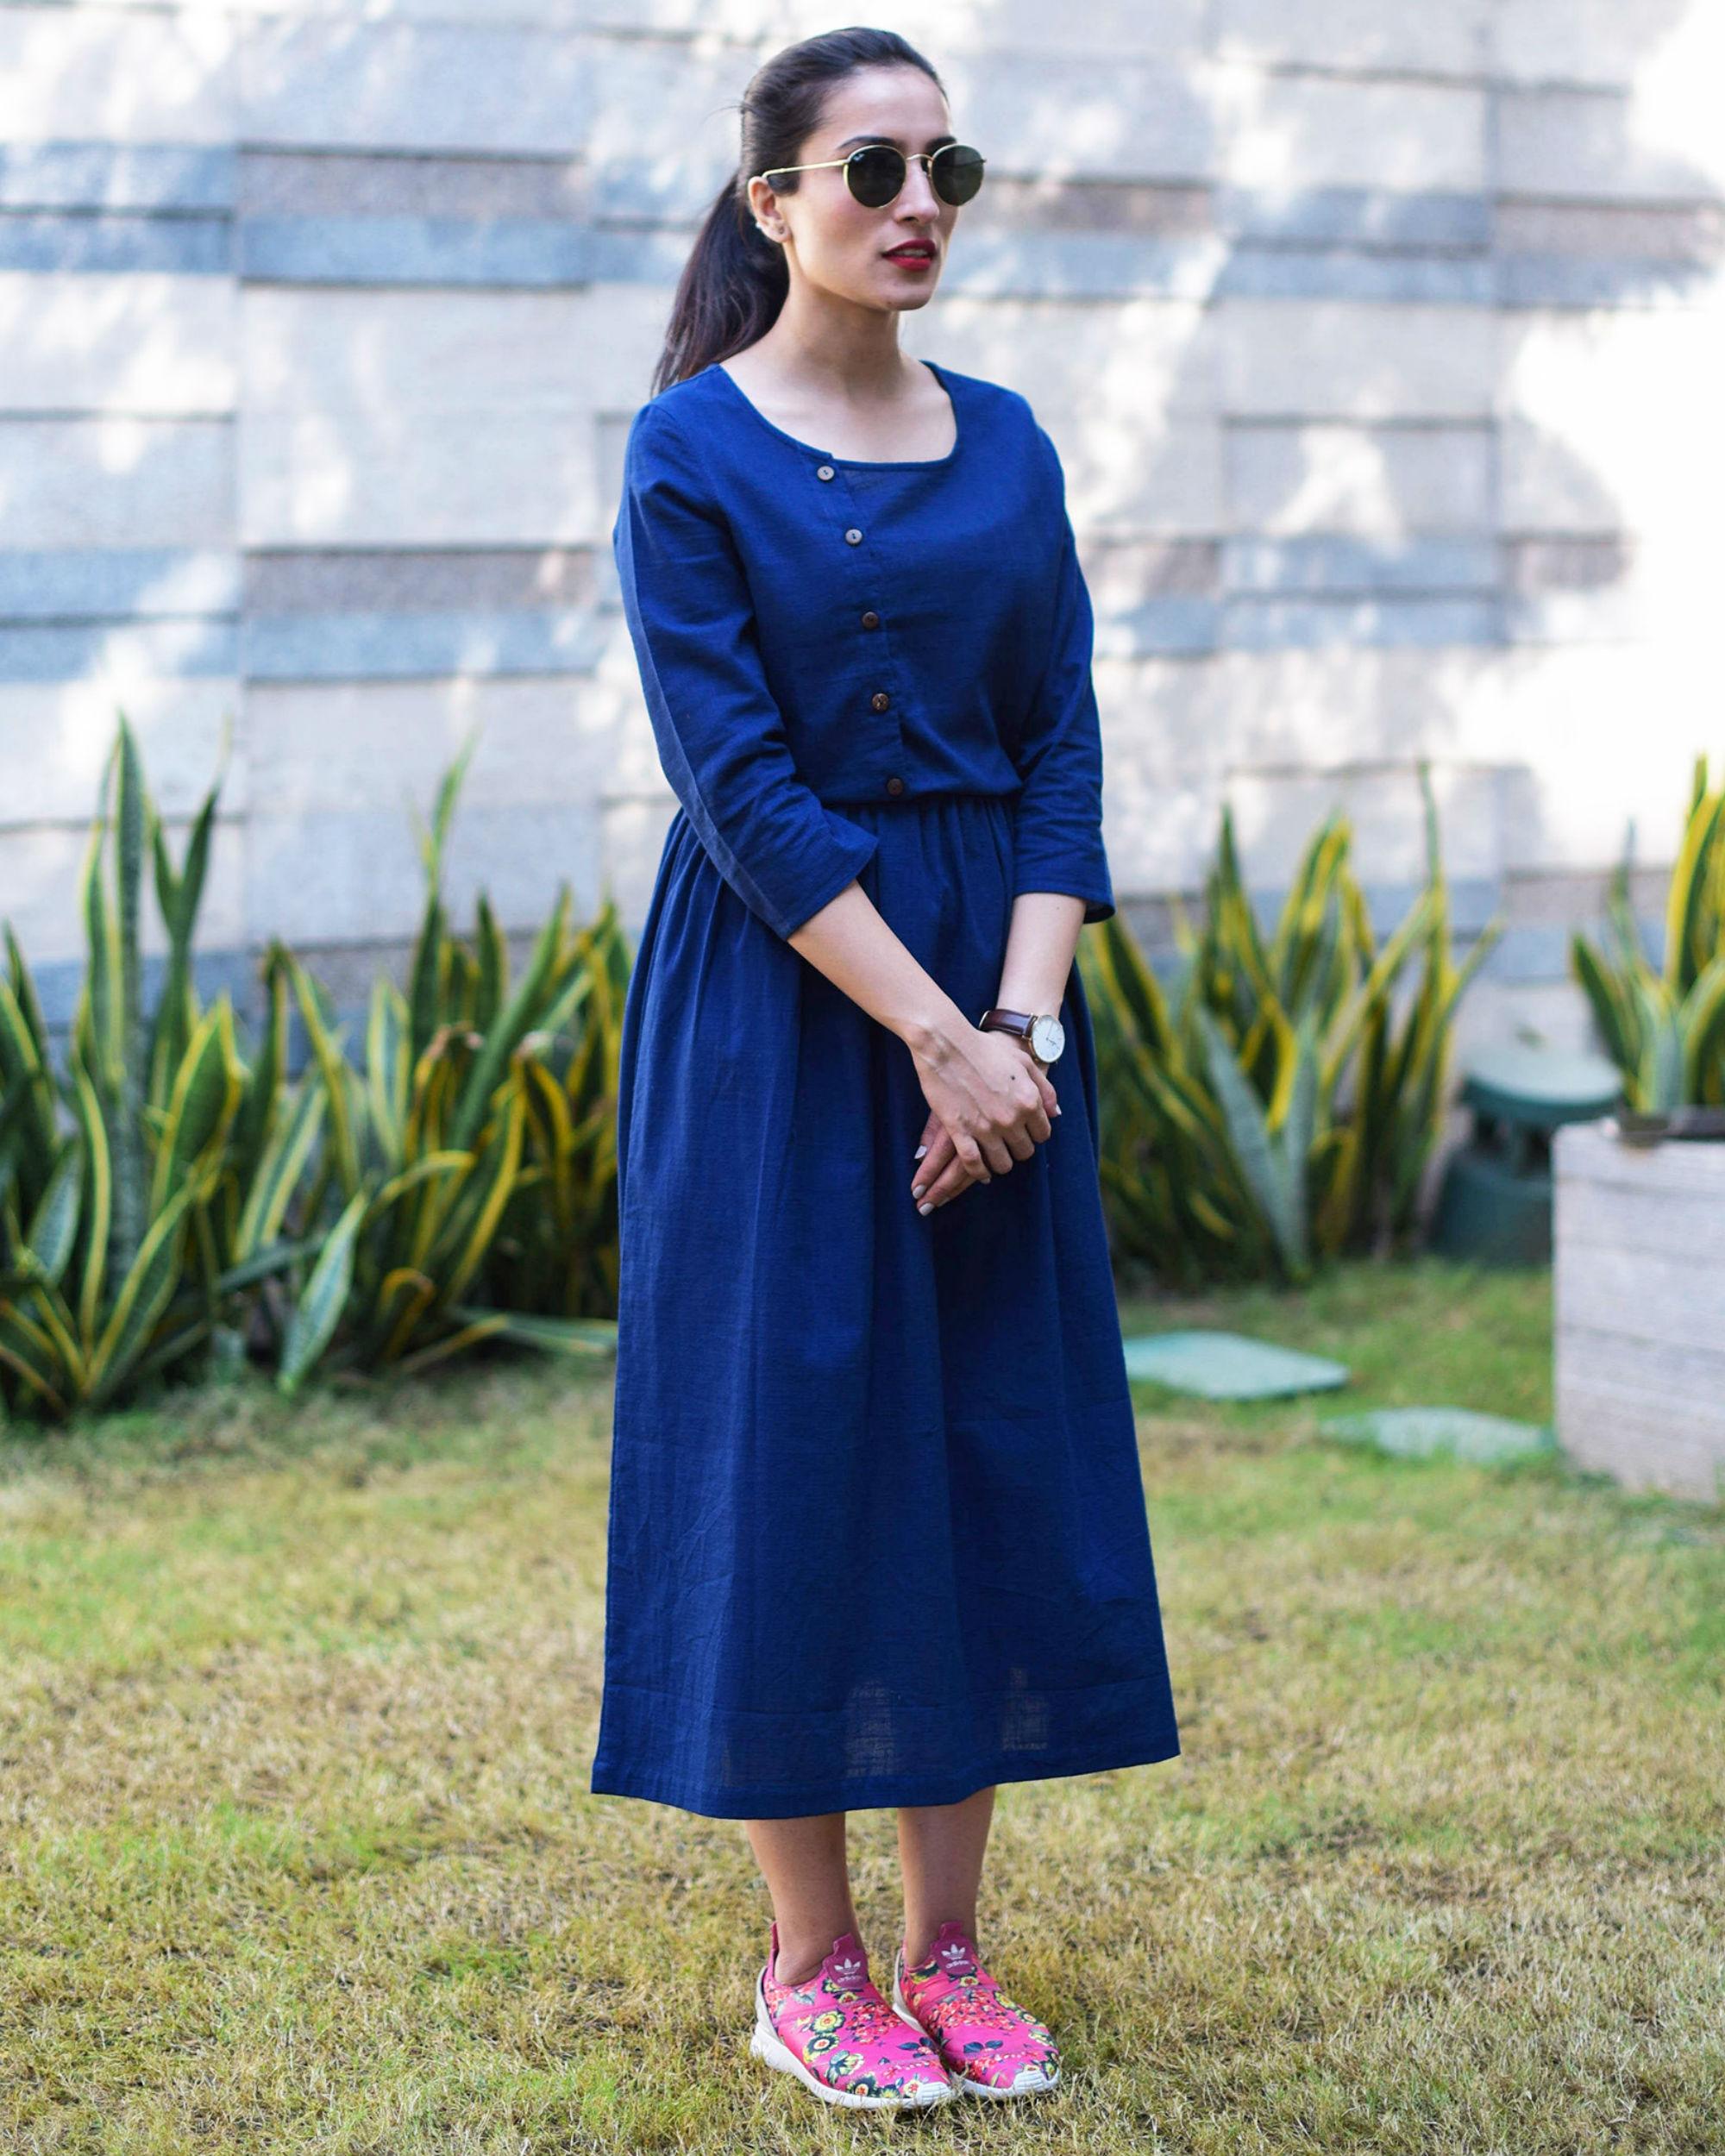 Indigo vintage dress